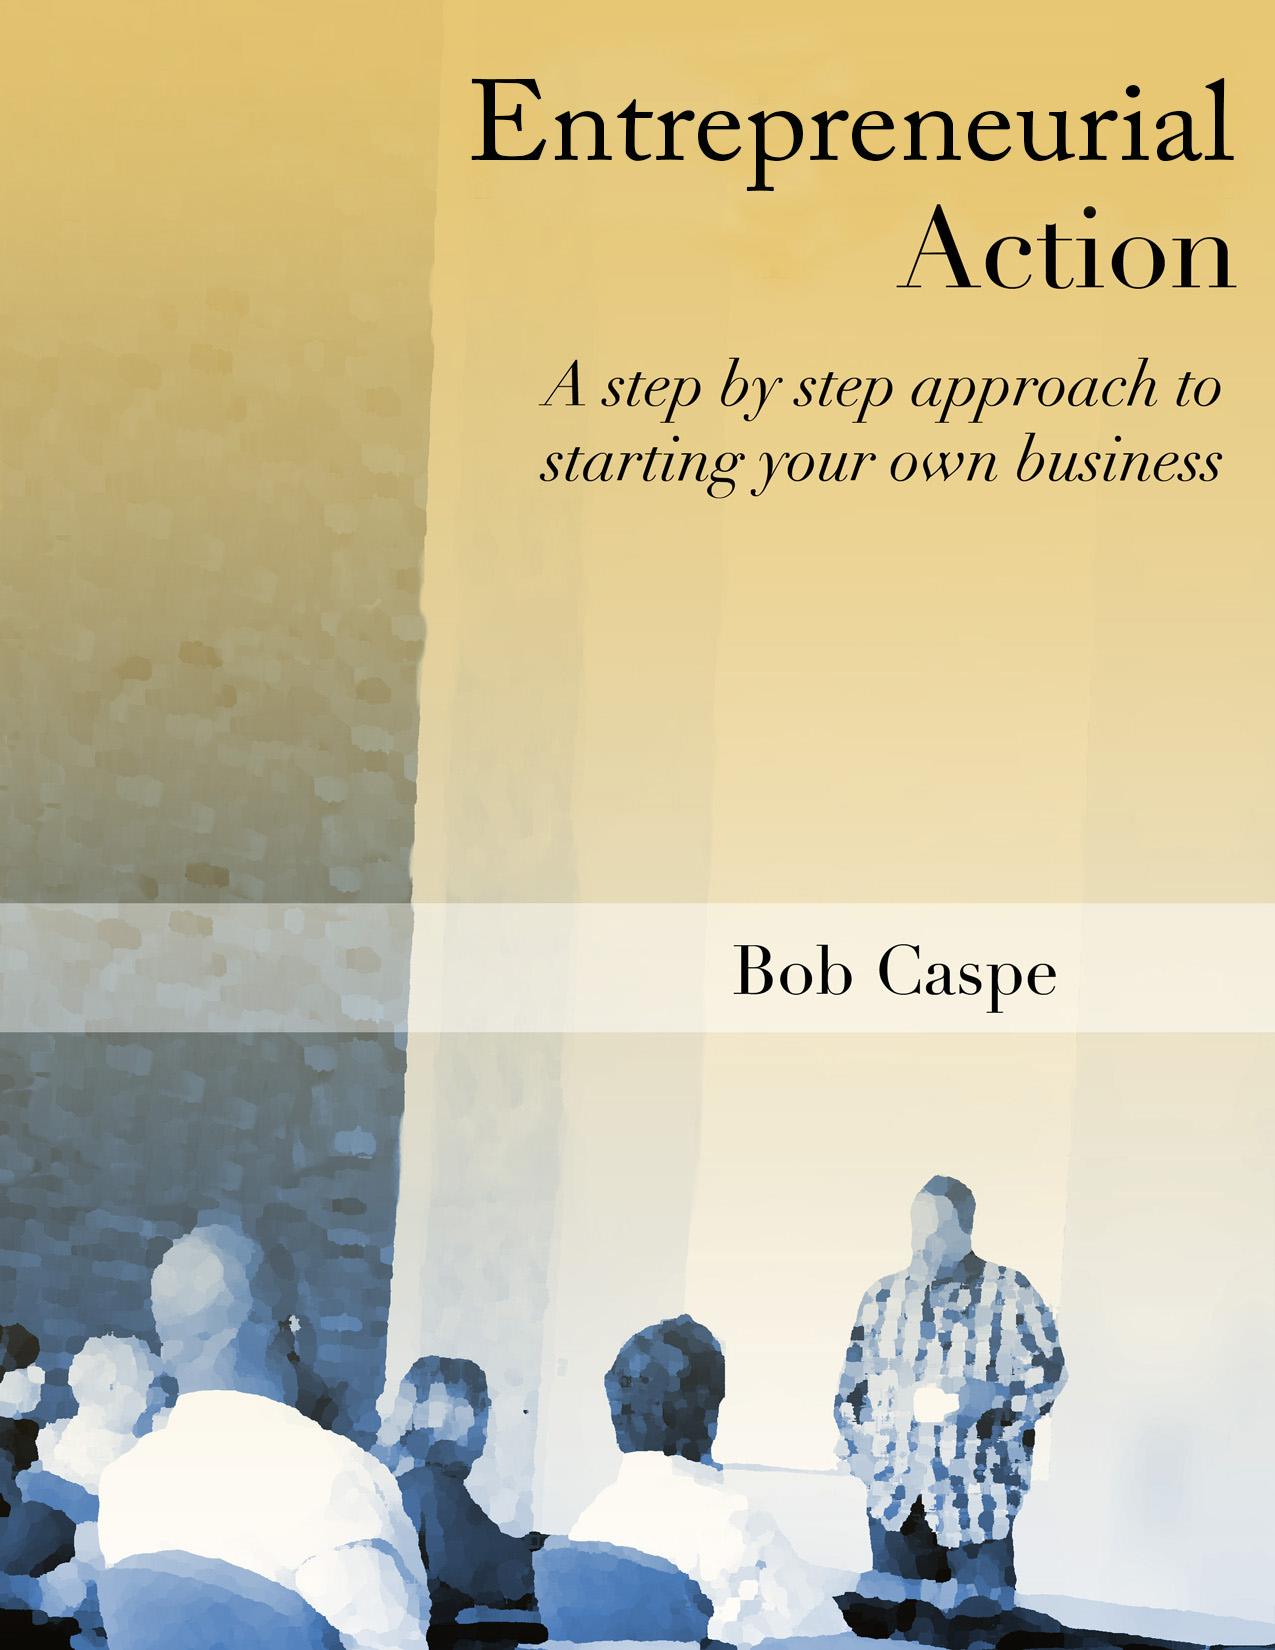 Entrepreneurial Action Version 2.5.12